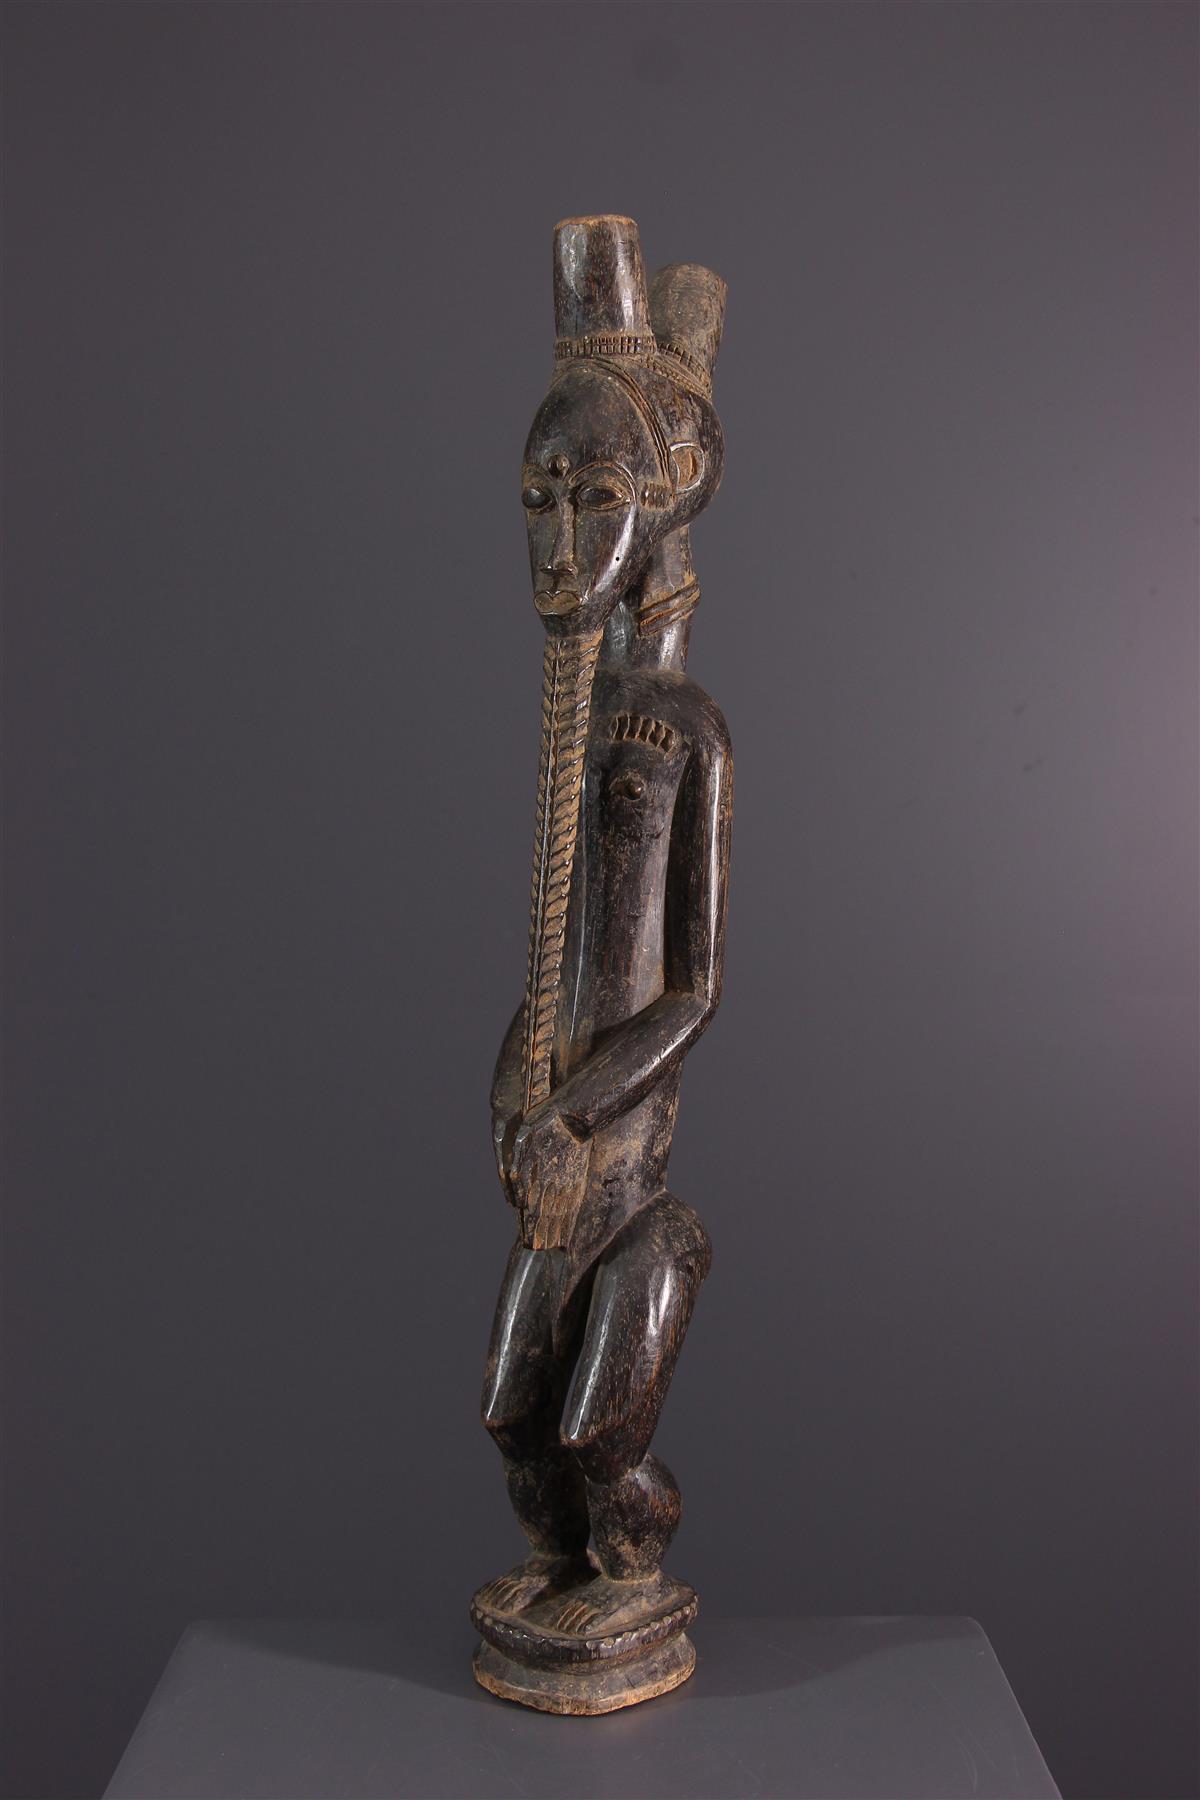 Baoule standbeeld - Afrikaanse kunst